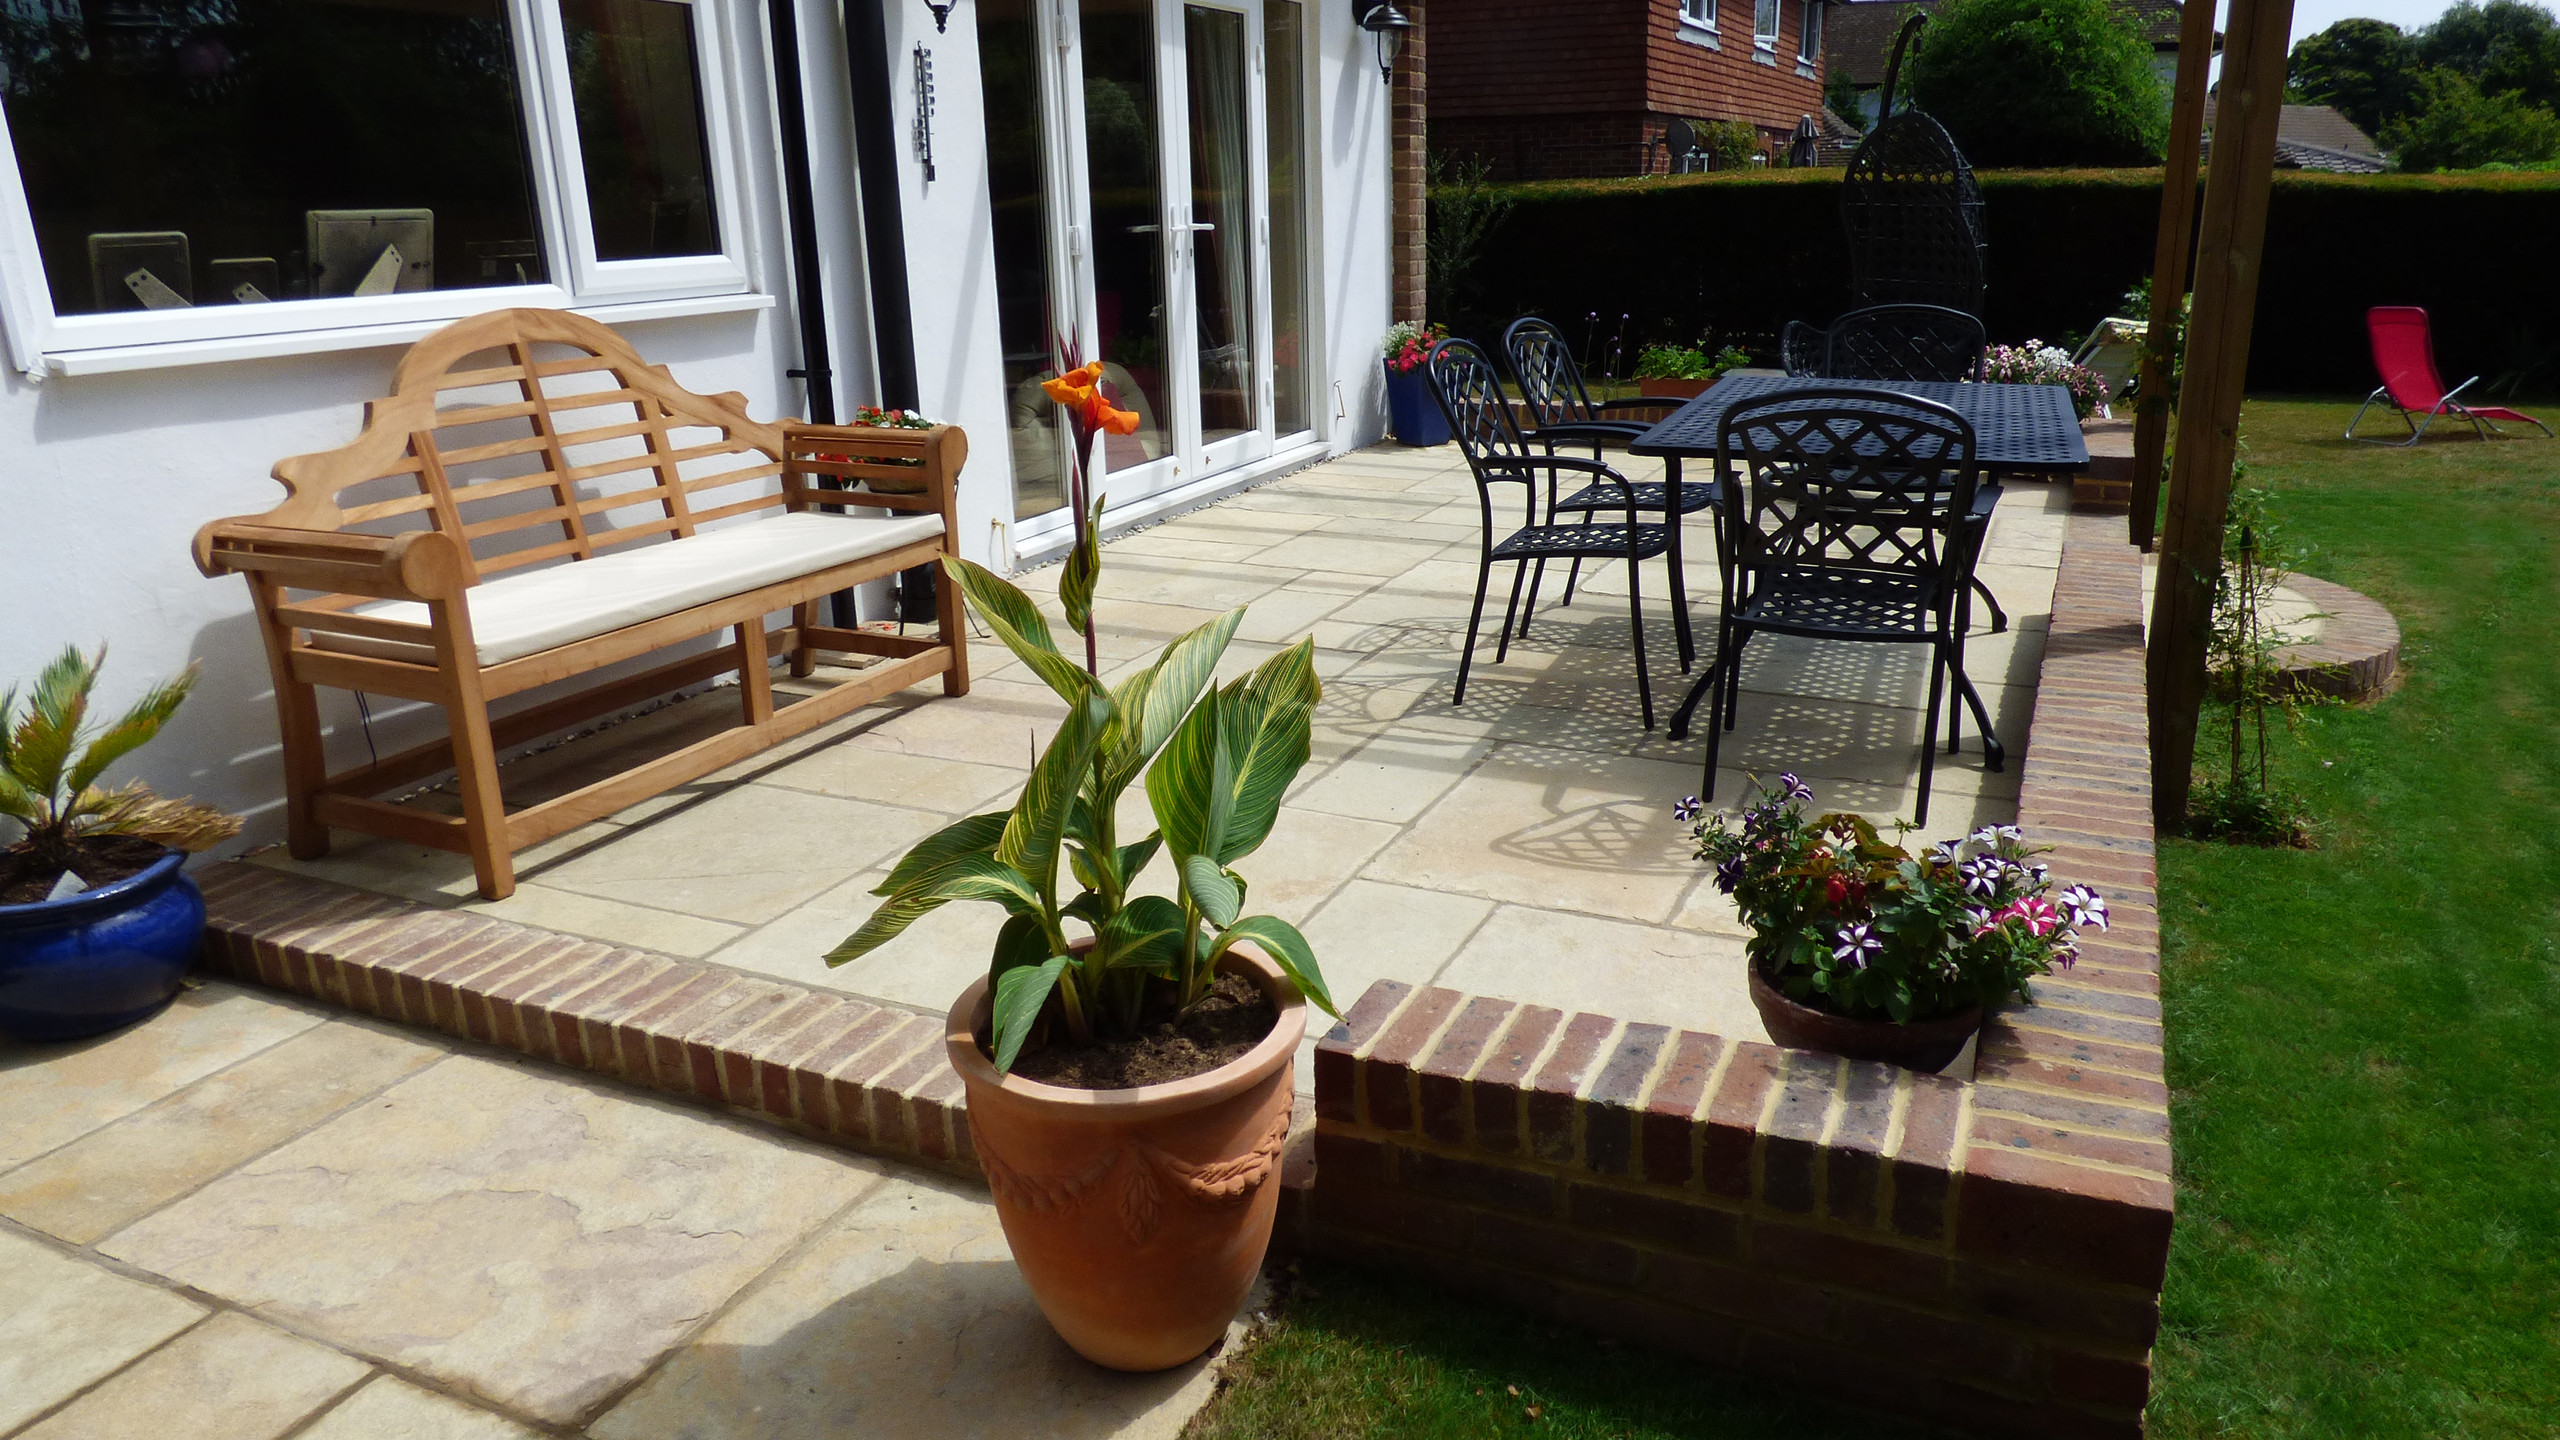 Brett Limestone patio with brick edging and retaining walls.